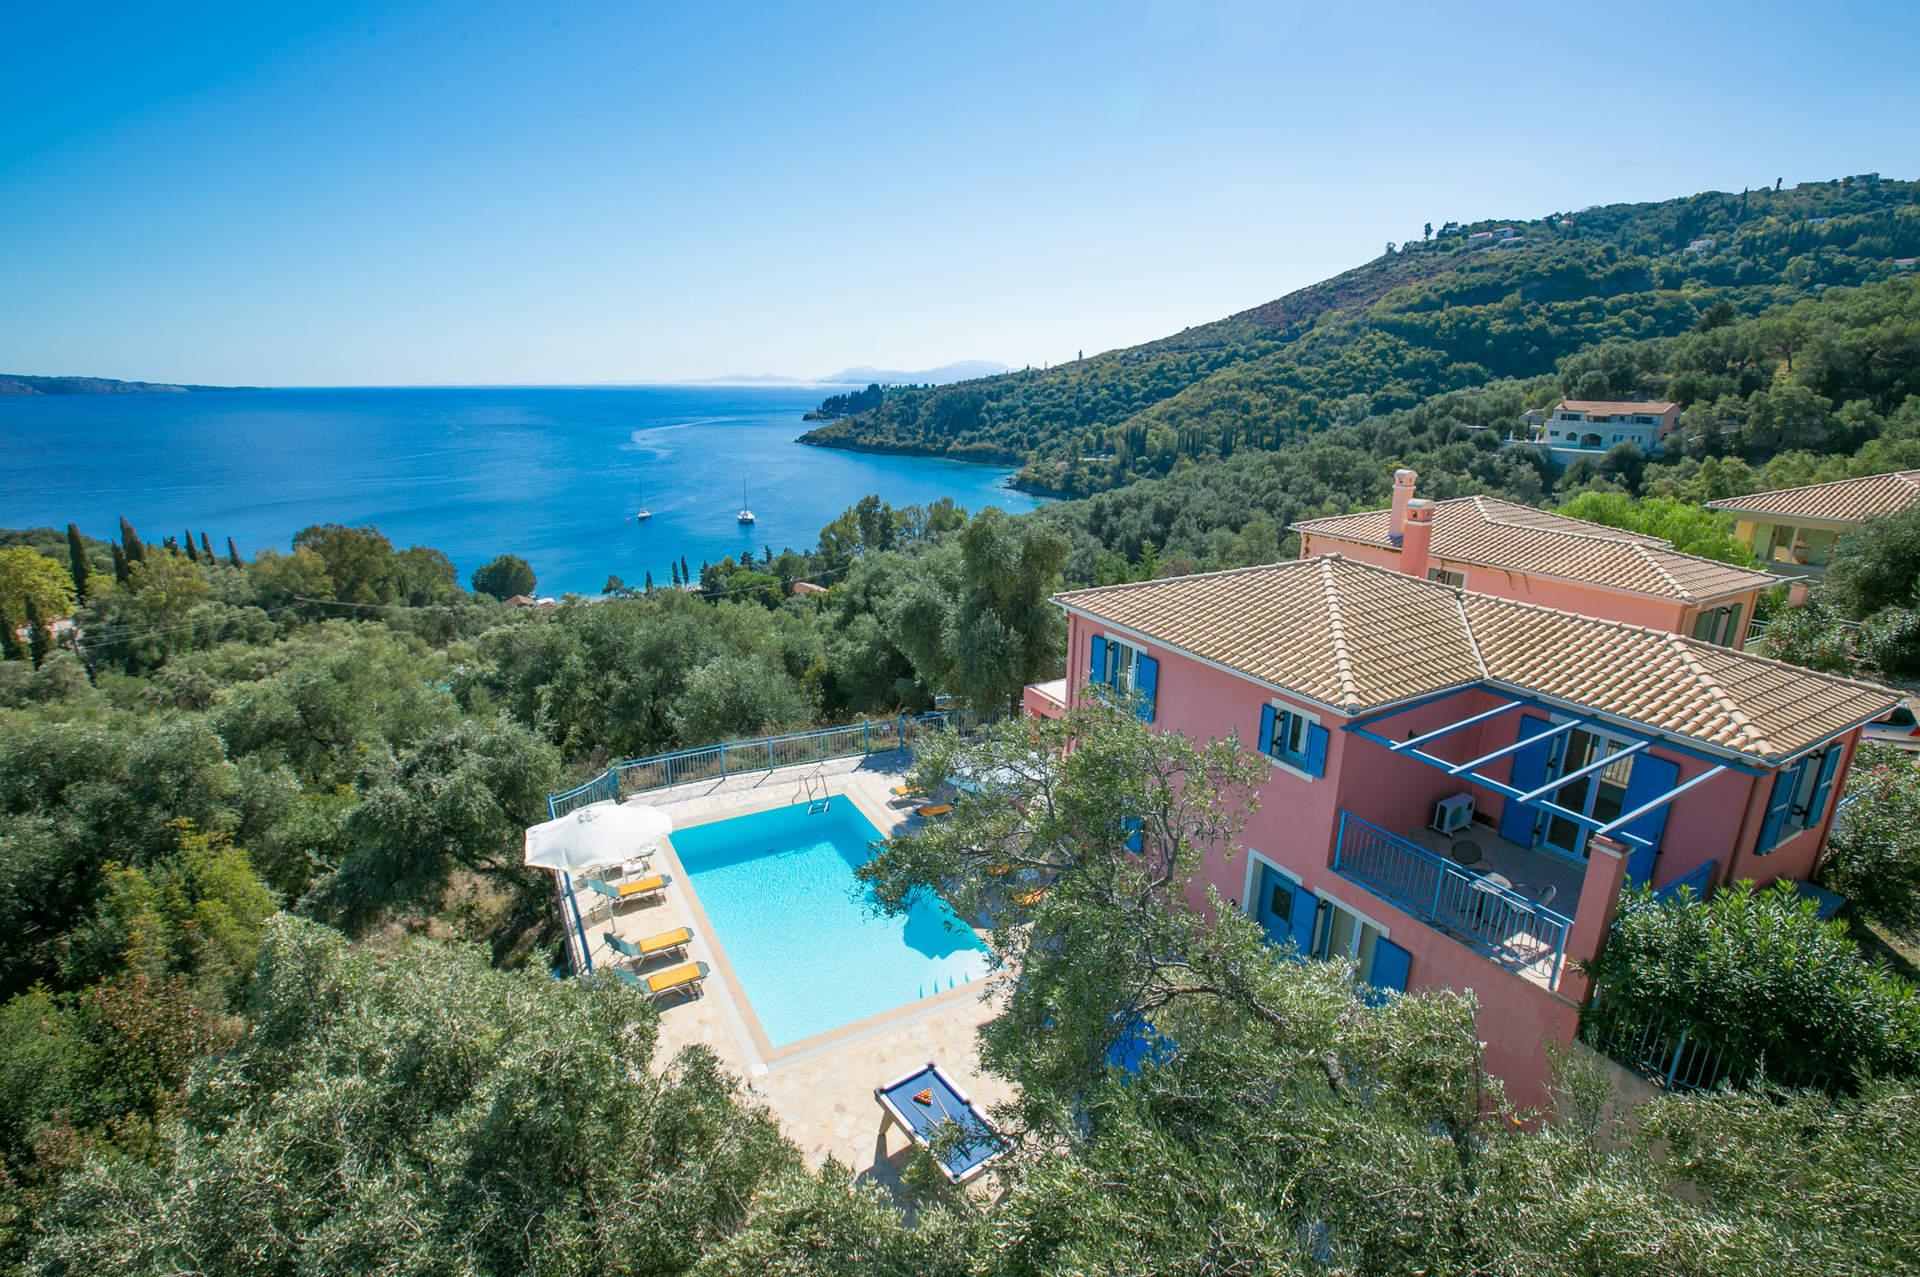 Villa Kerasia Anatoli, Agios Stefanos, Corfu, Greece